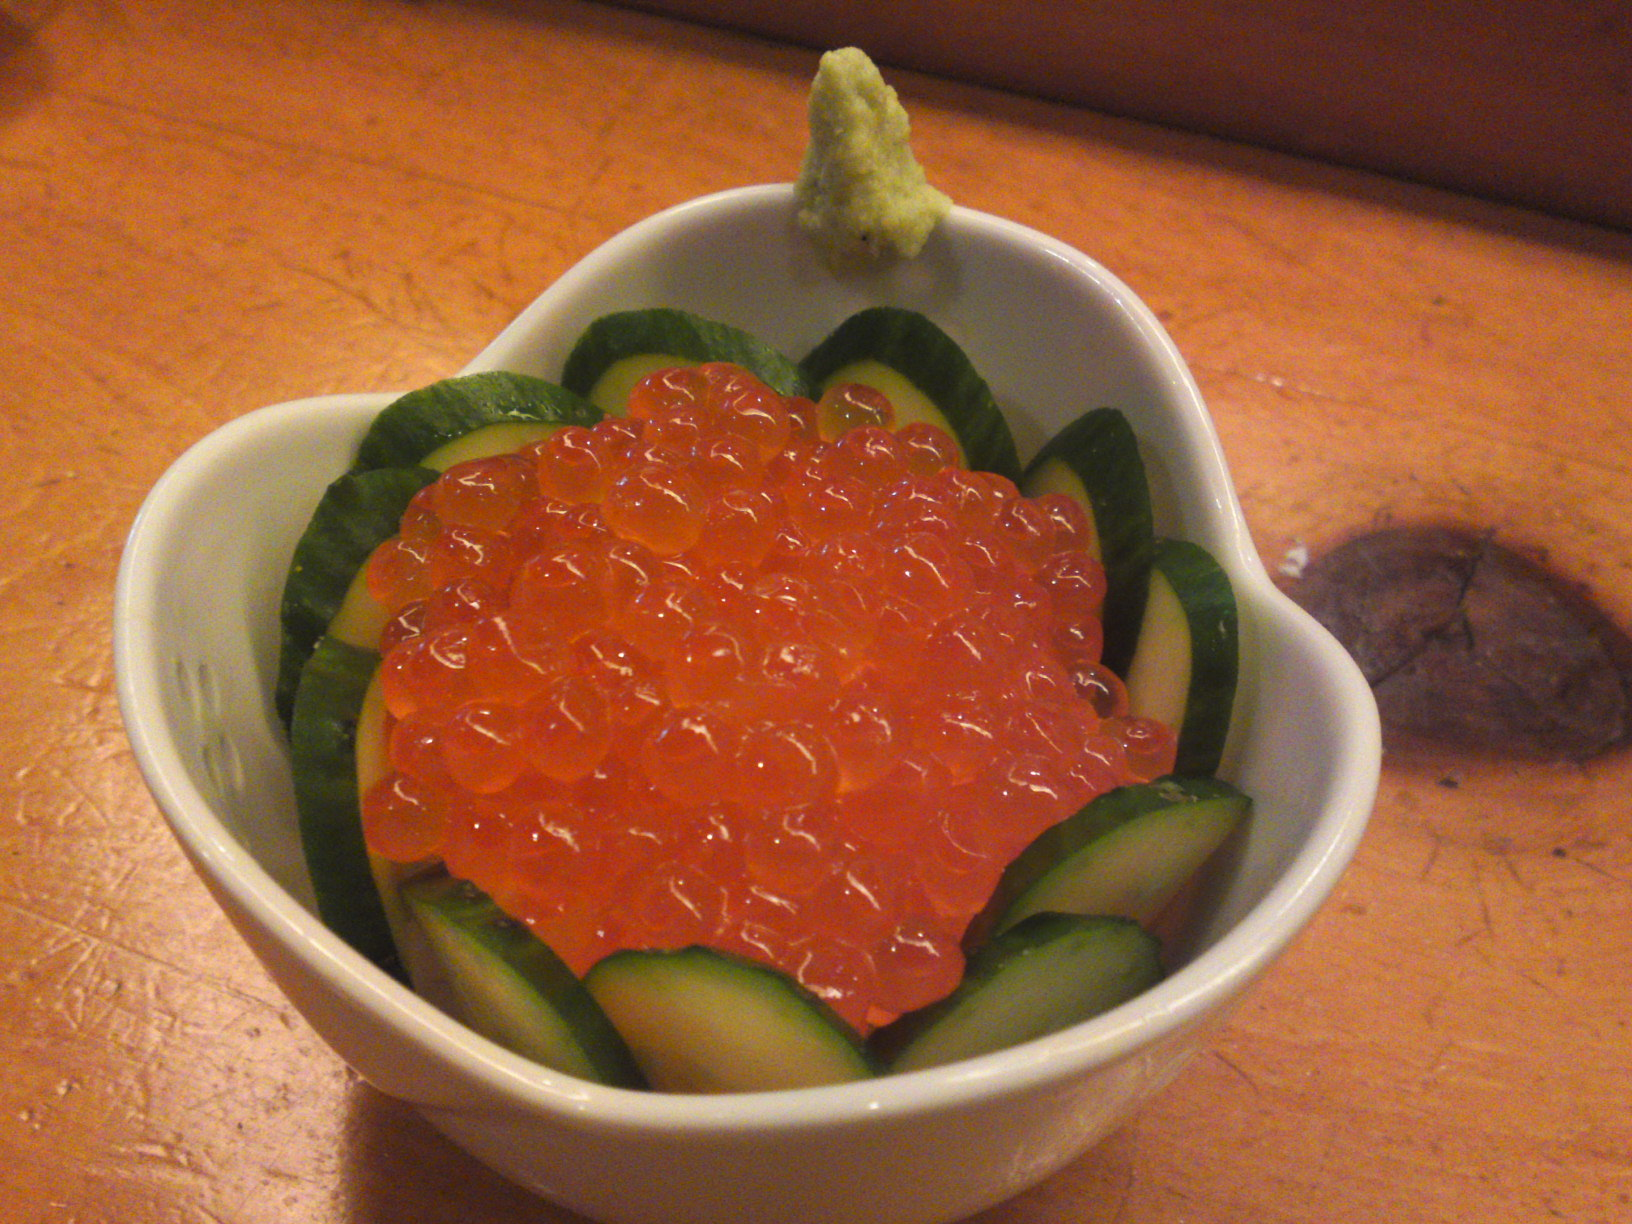 """Ikura/Salmon roe"" ko donburi with sliced cucumber and grated fresh wasabi"